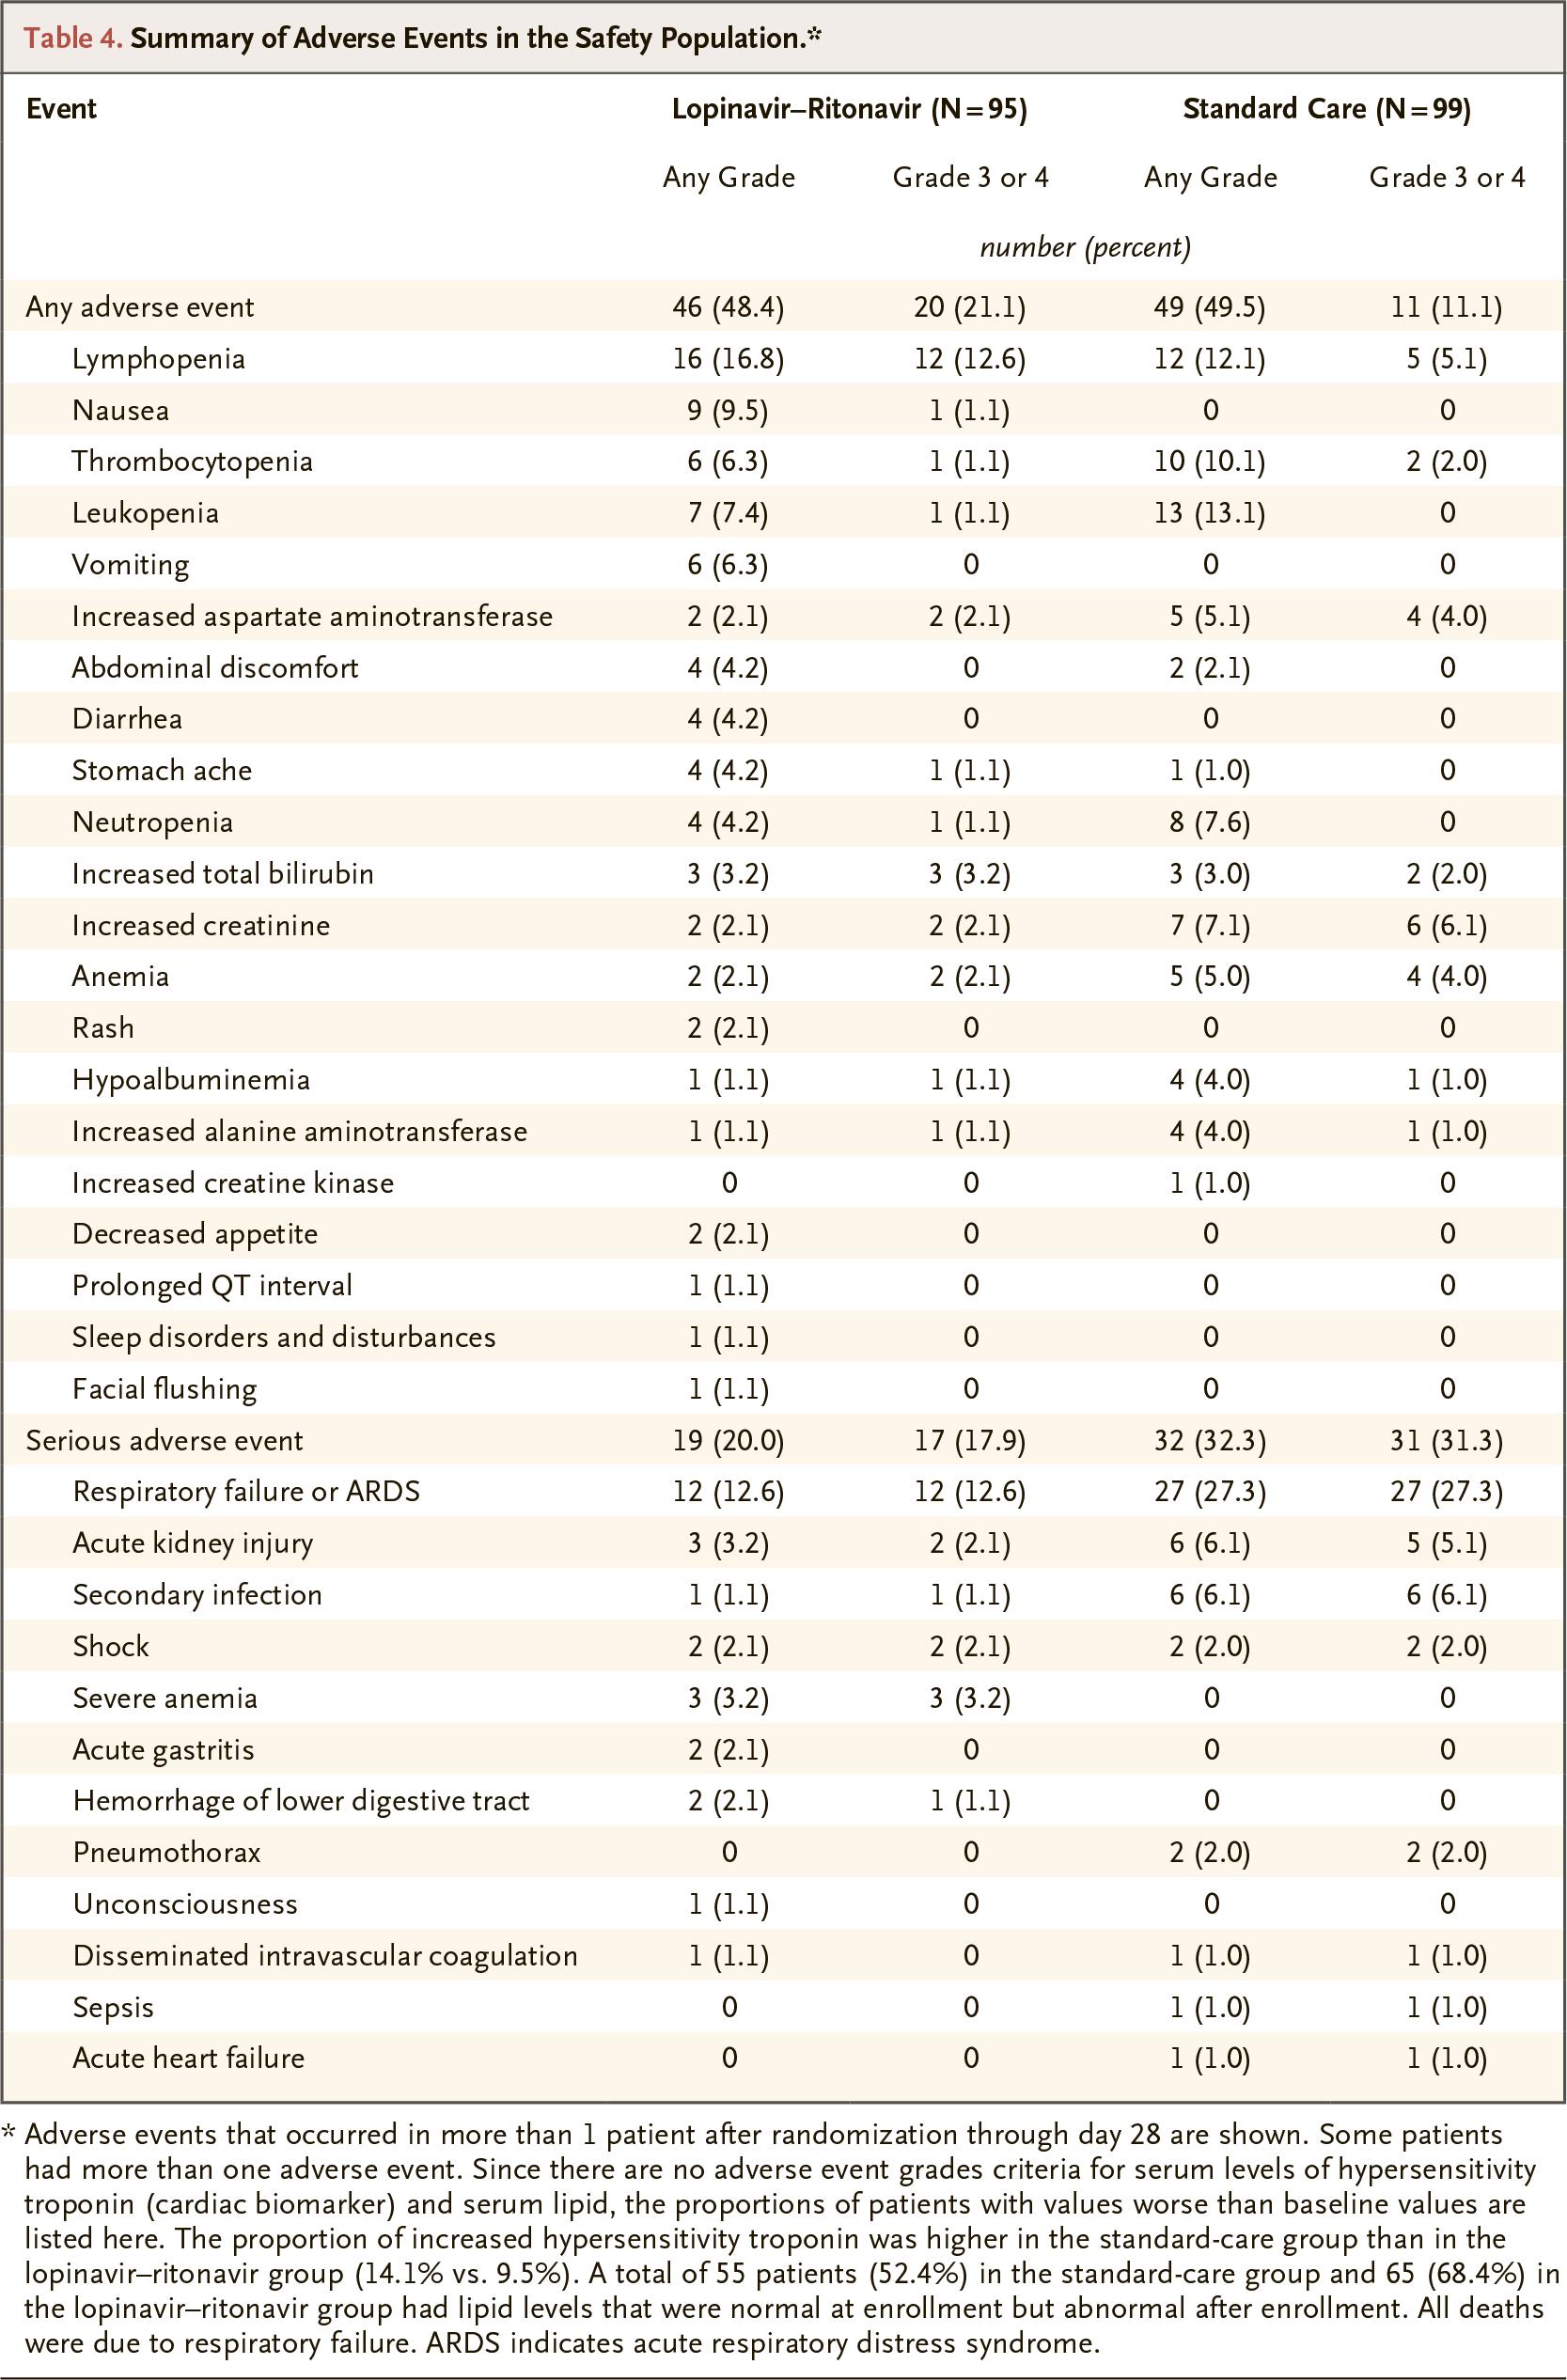 chictr2000029308 results 15 - Коронавирус. Лекарства. Лопинавир и ритонавир не помогли в лечении COVID-19